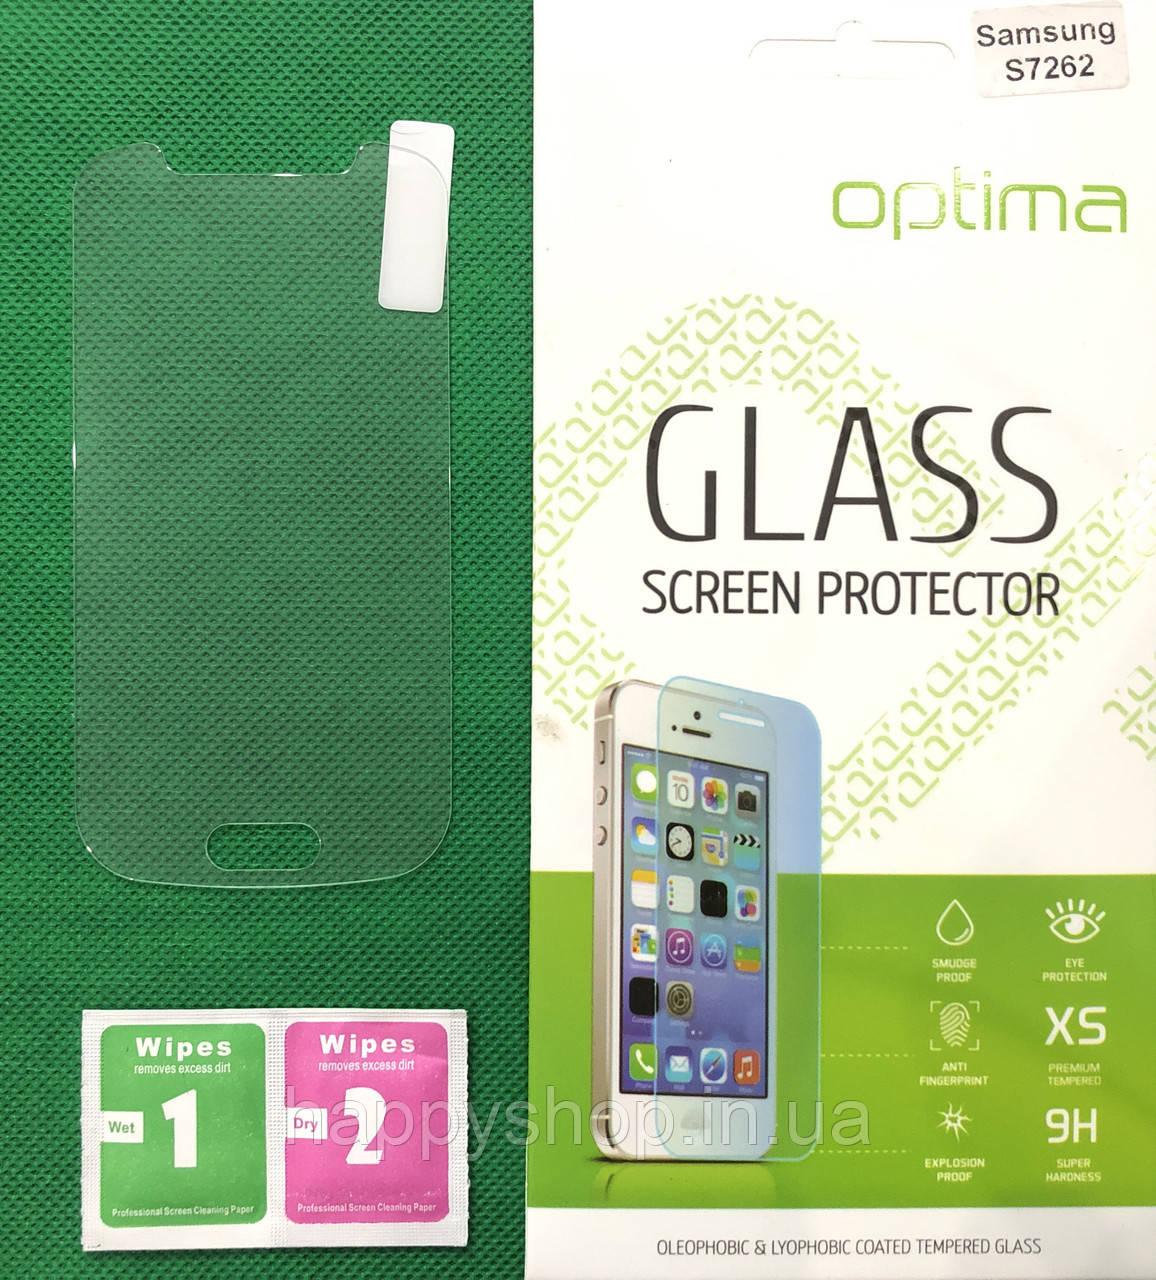 Защитное стекло Samsung Galaxy Star plus S7262/S7260